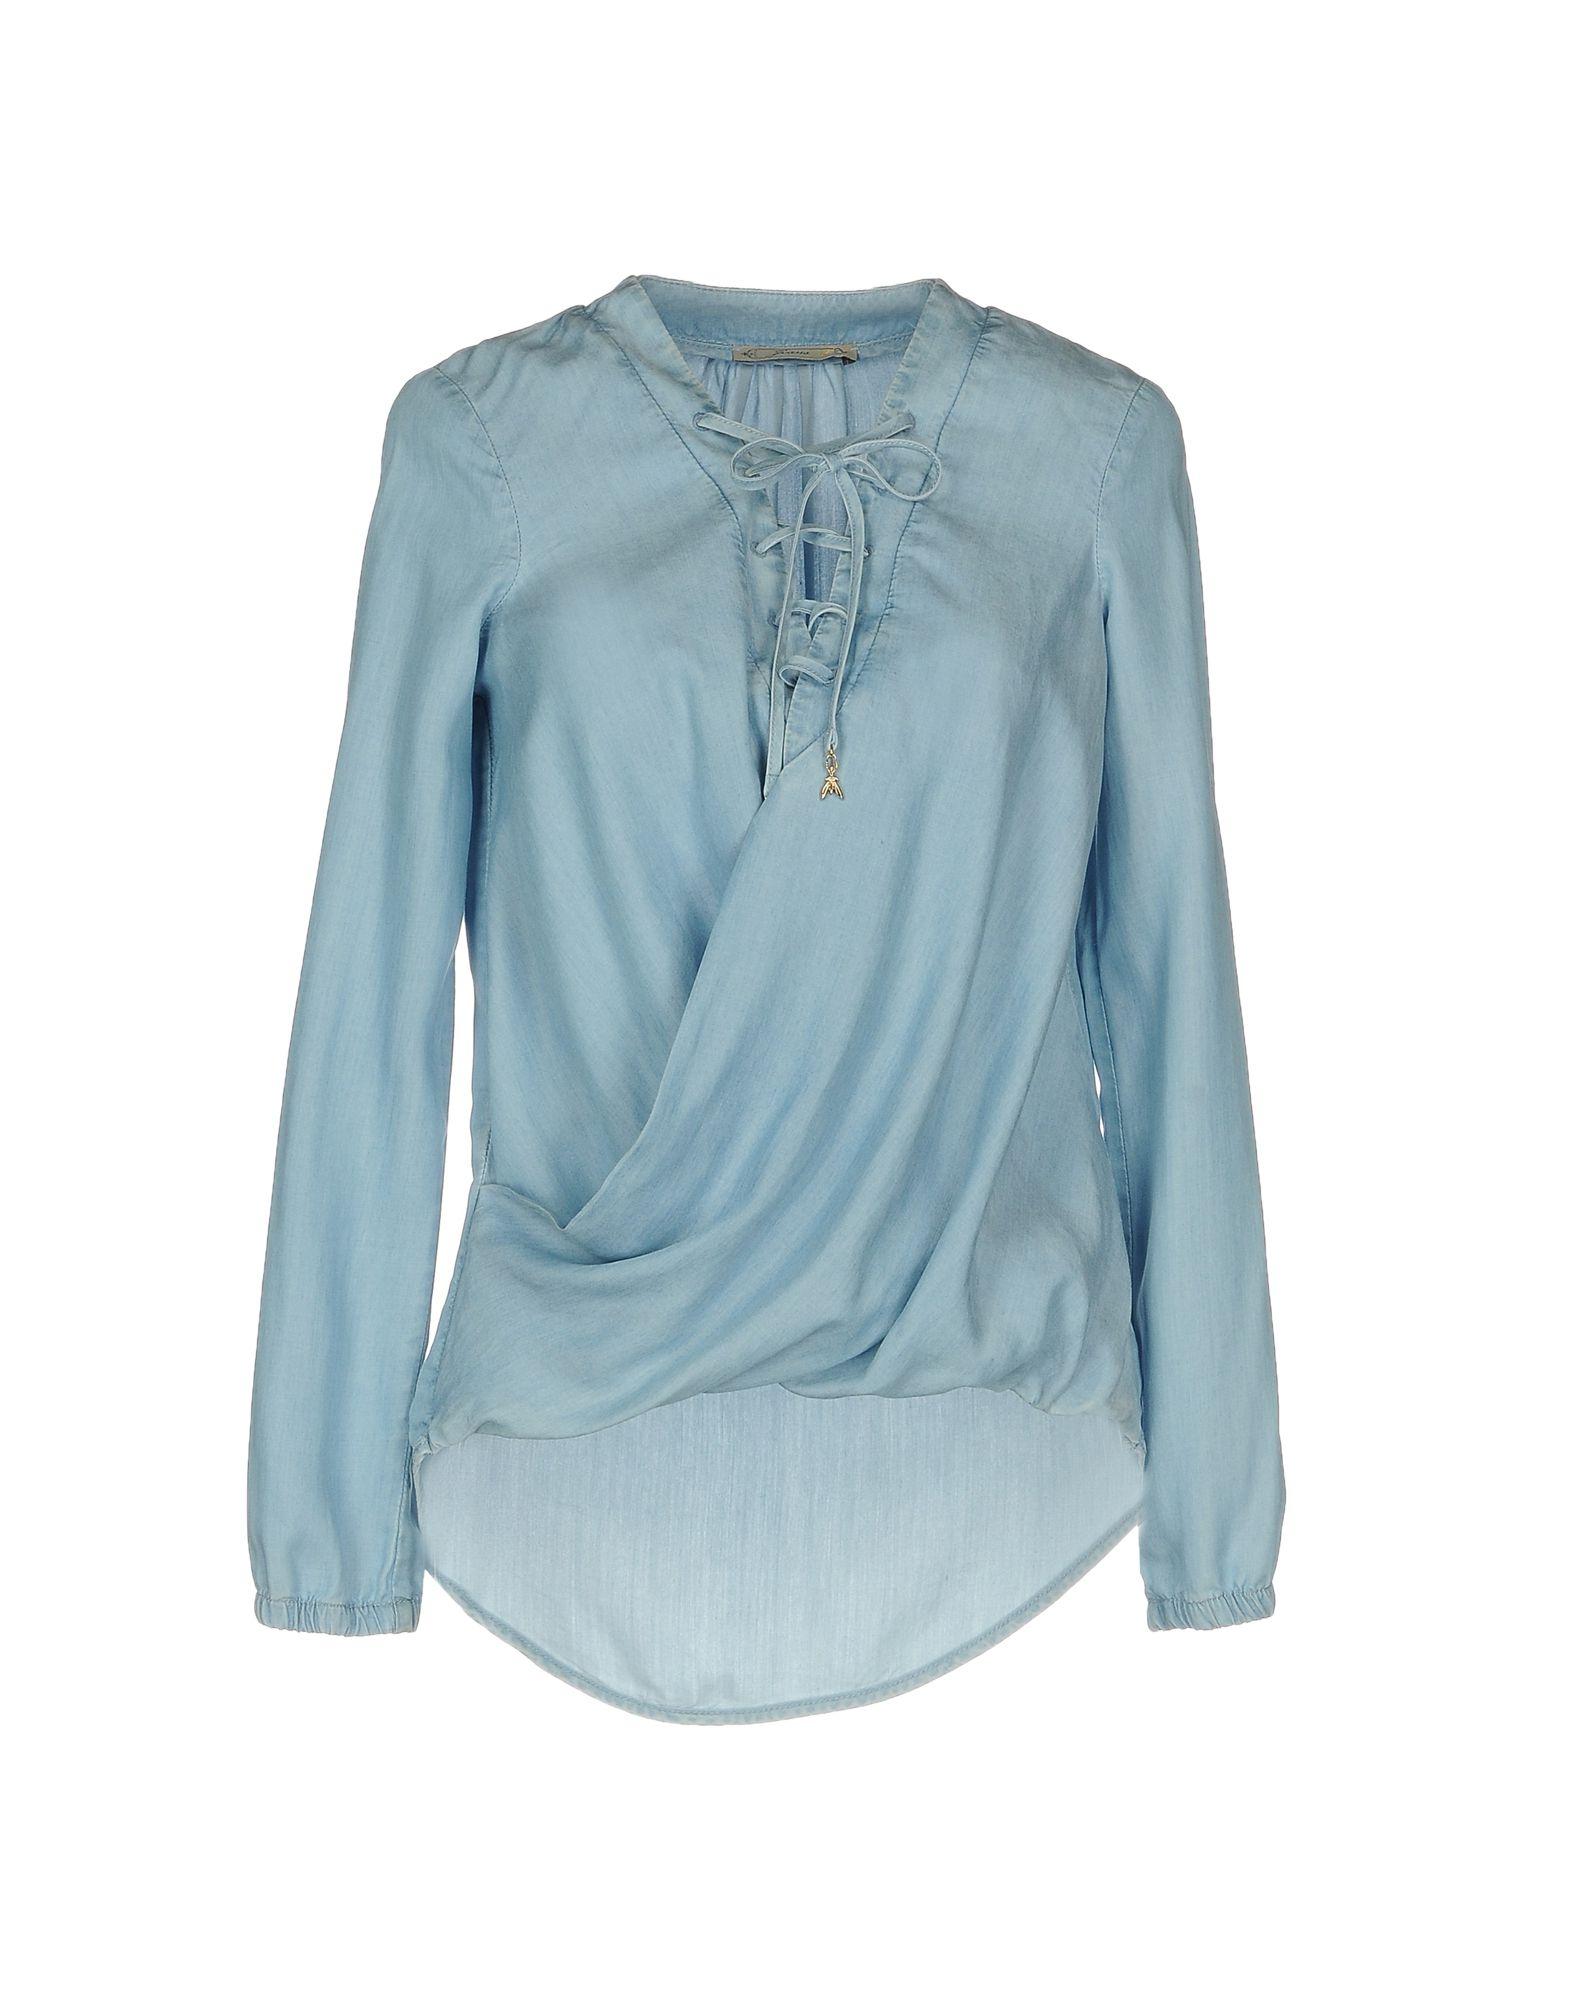 PATRIZIA PEPE Джинсовая рубашка allievi джинсовая рубашка